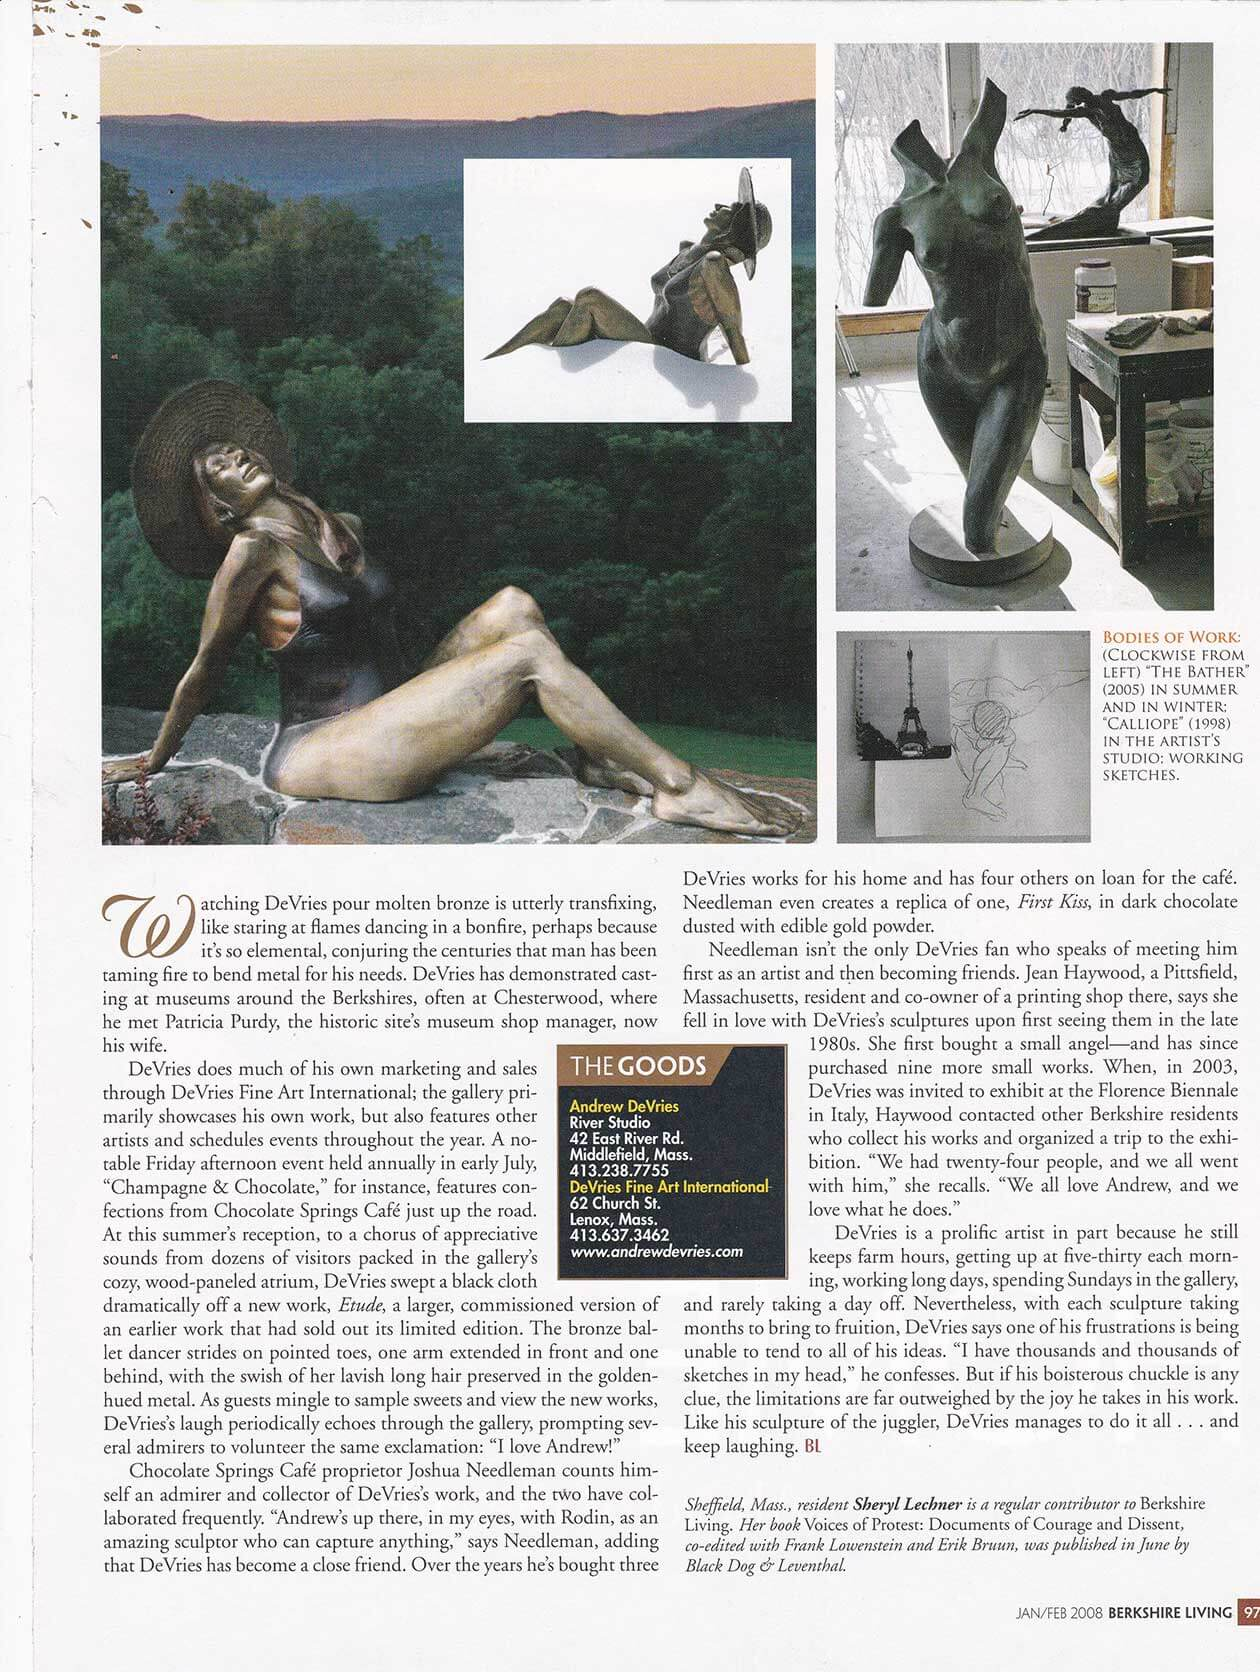 Berkshire Living Magazine January/February 2008 page 97